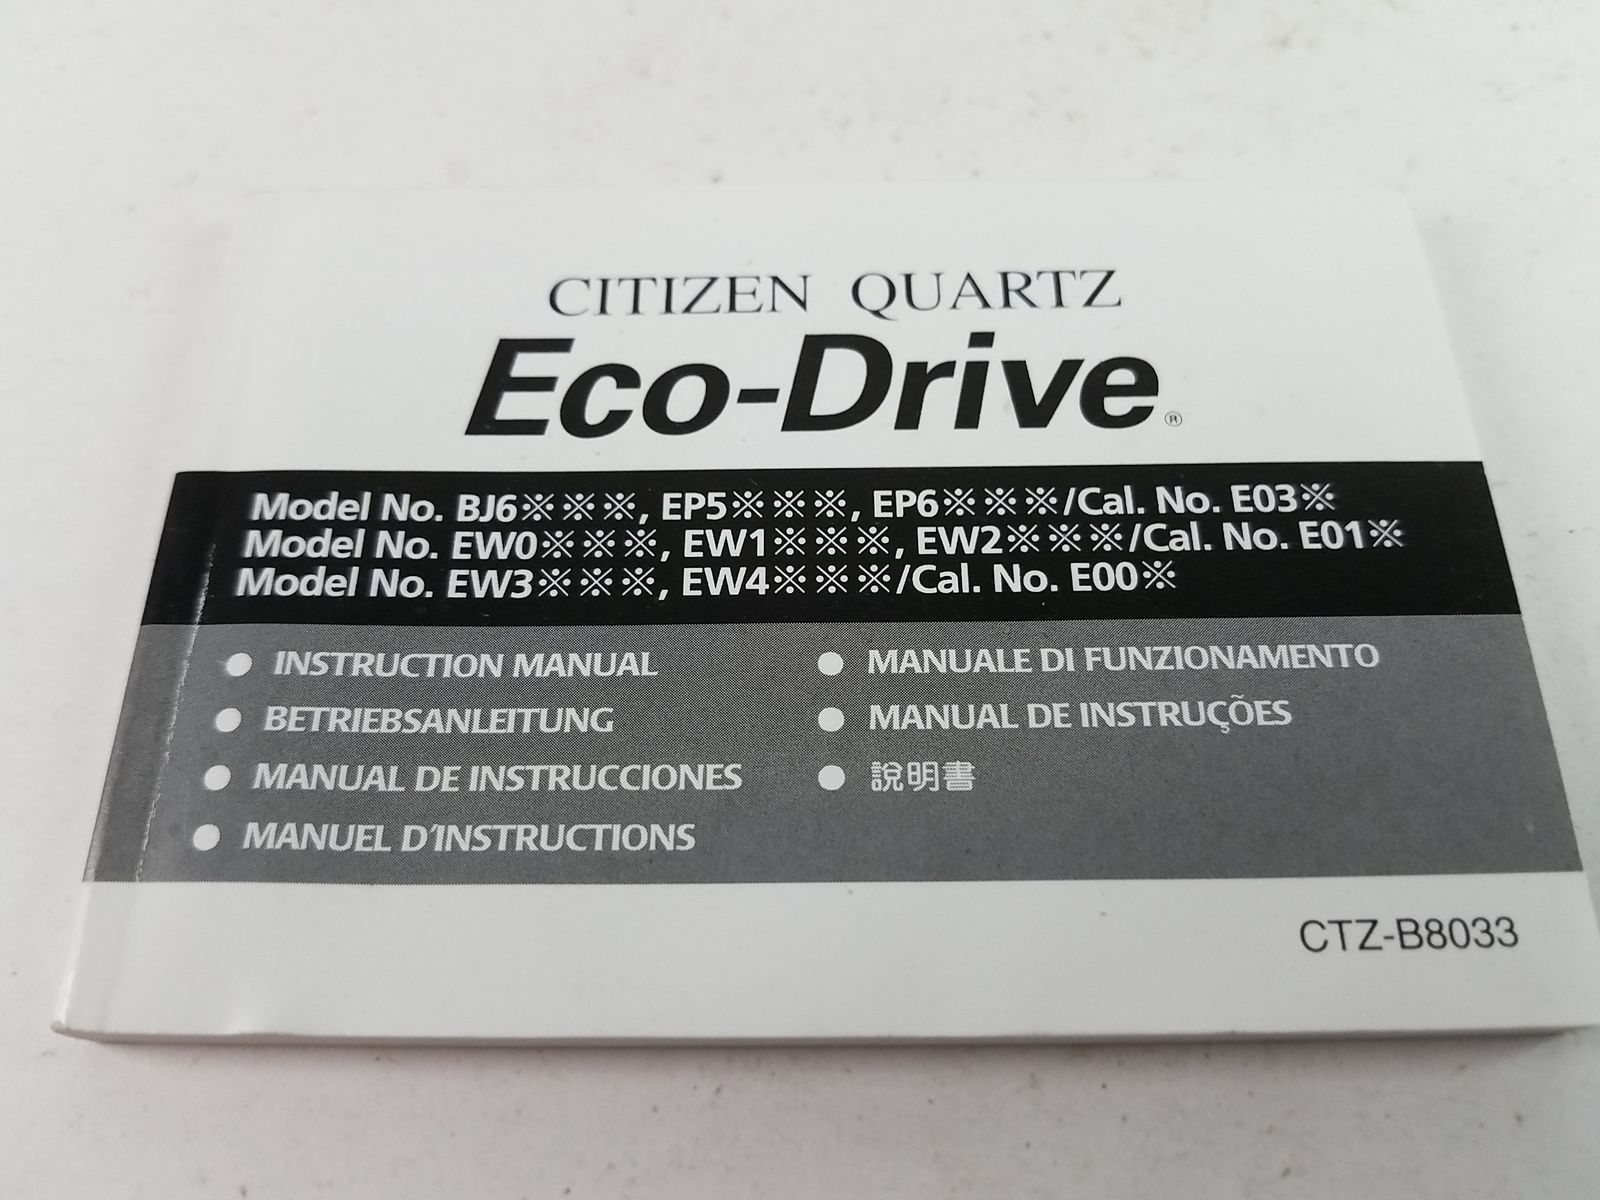 citizen quartz eco drive instruction manual booklet ctz b8033 rh seniorprovide top citizen eco drive wr 200 instruction manual citizen eco drive instruction manual